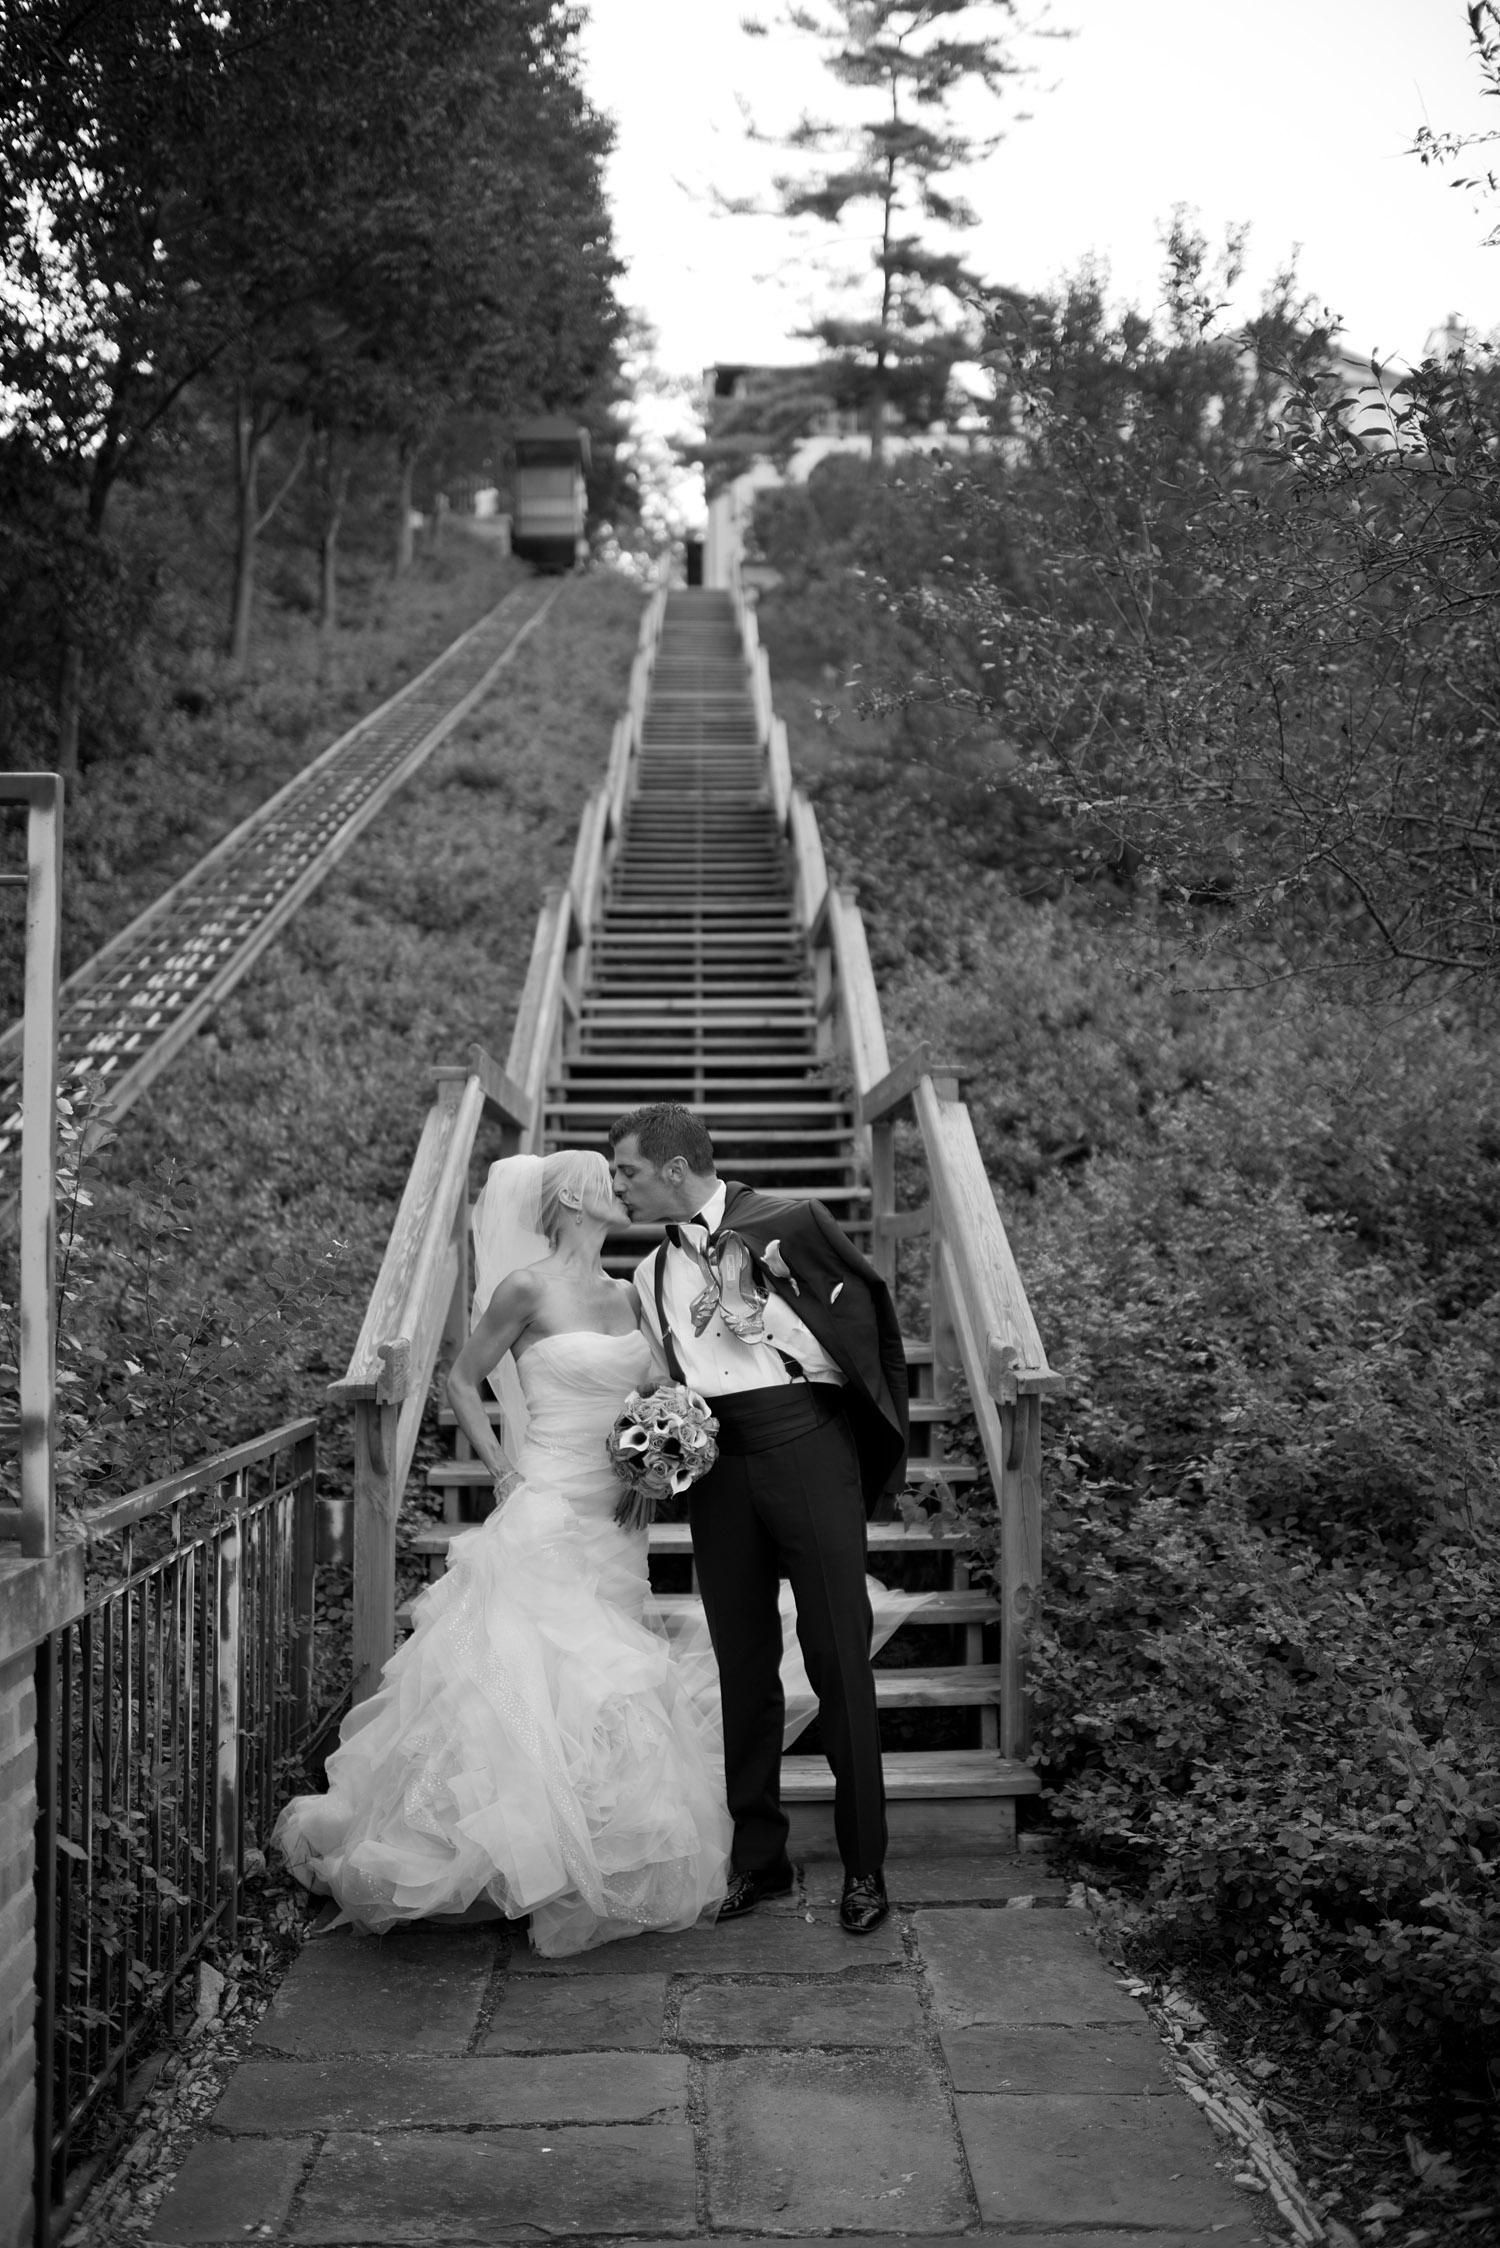 destination wedding photographer lexia frank photographs an italian destination wedding at the villa terrace